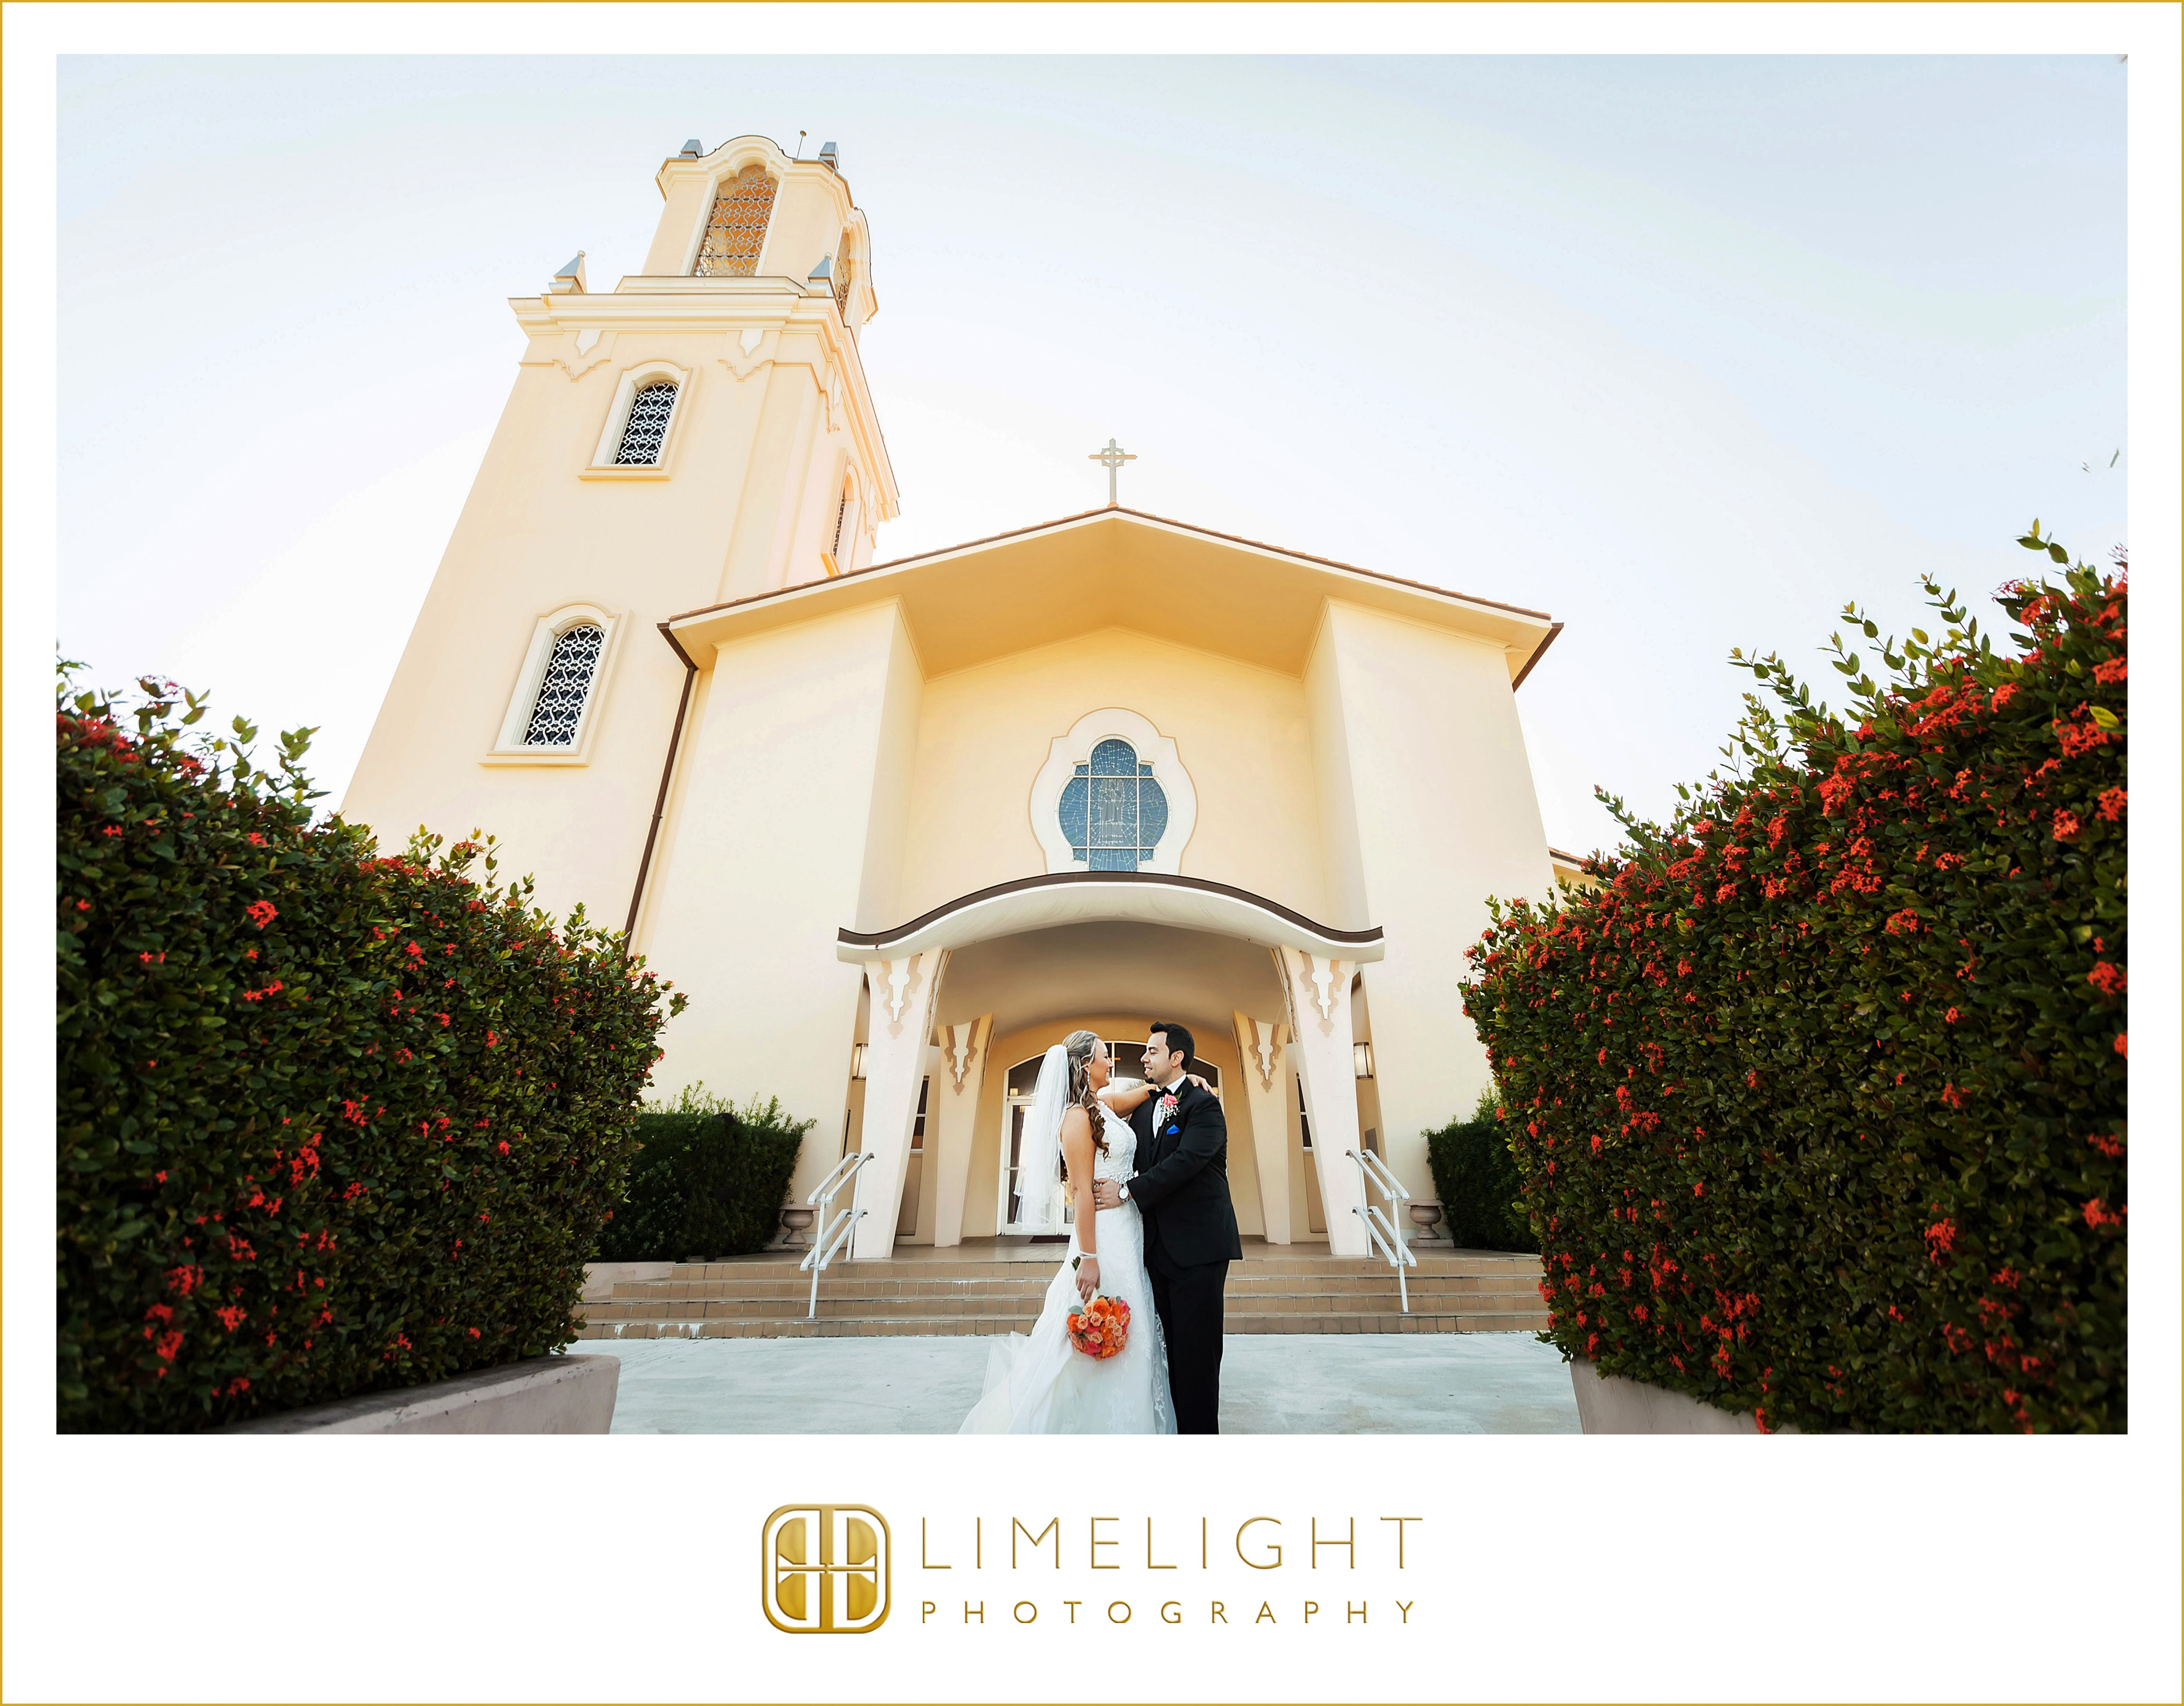 Wedding Limelightphotography Saint John Vianney Petersburg John Vianney Catholic Church